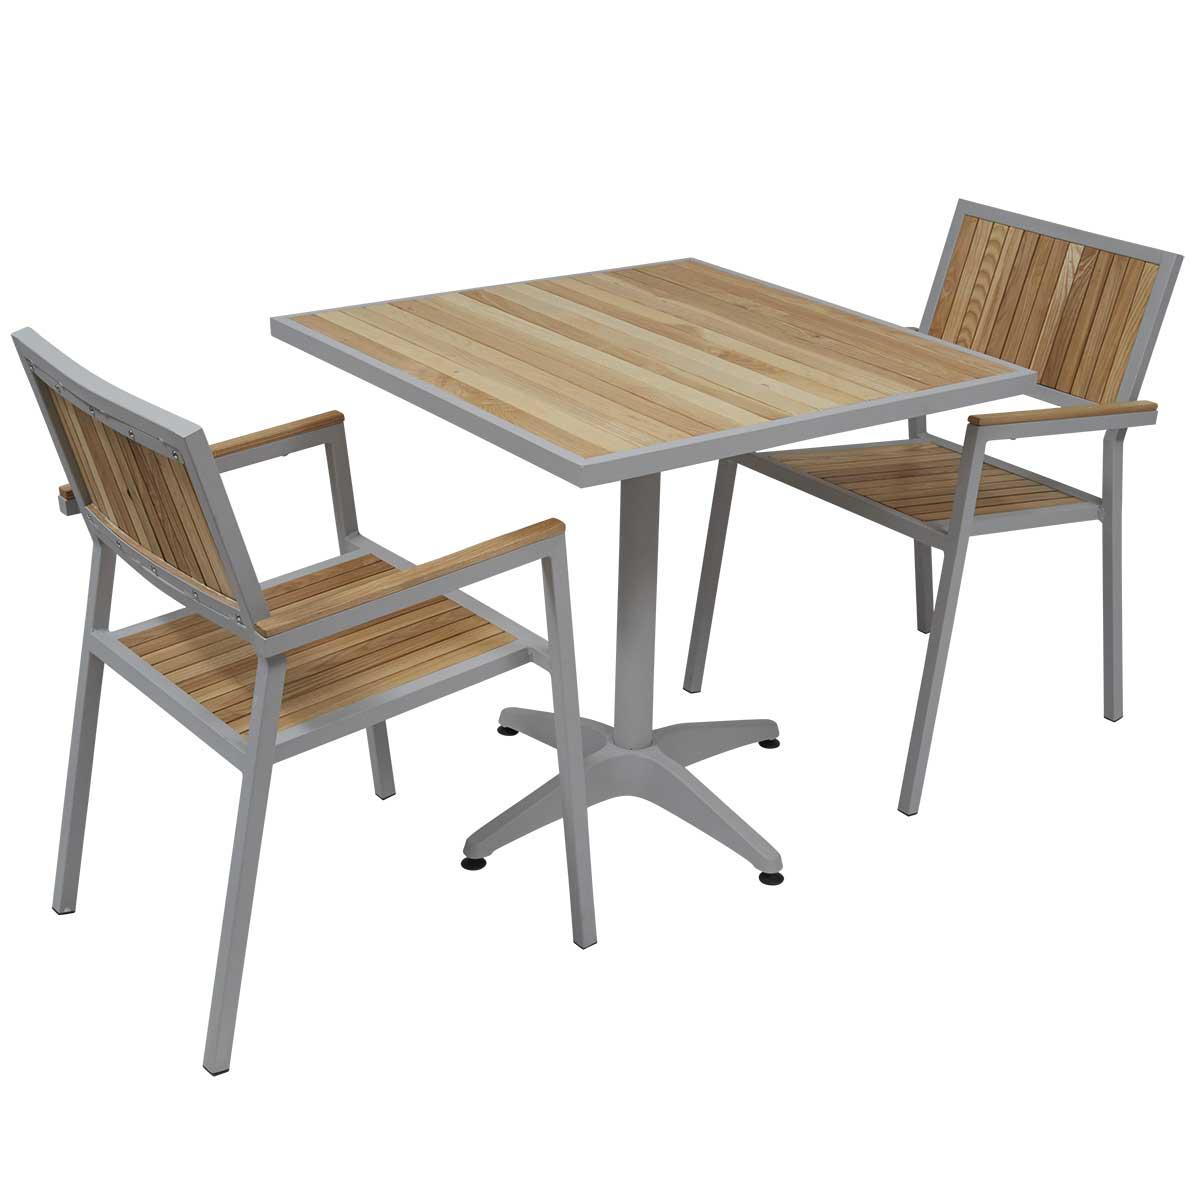 Table De Jardin Bistrot Charmant Table Terrasse Pas Cher Of 32 Luxe Table De Jardin Bistrot